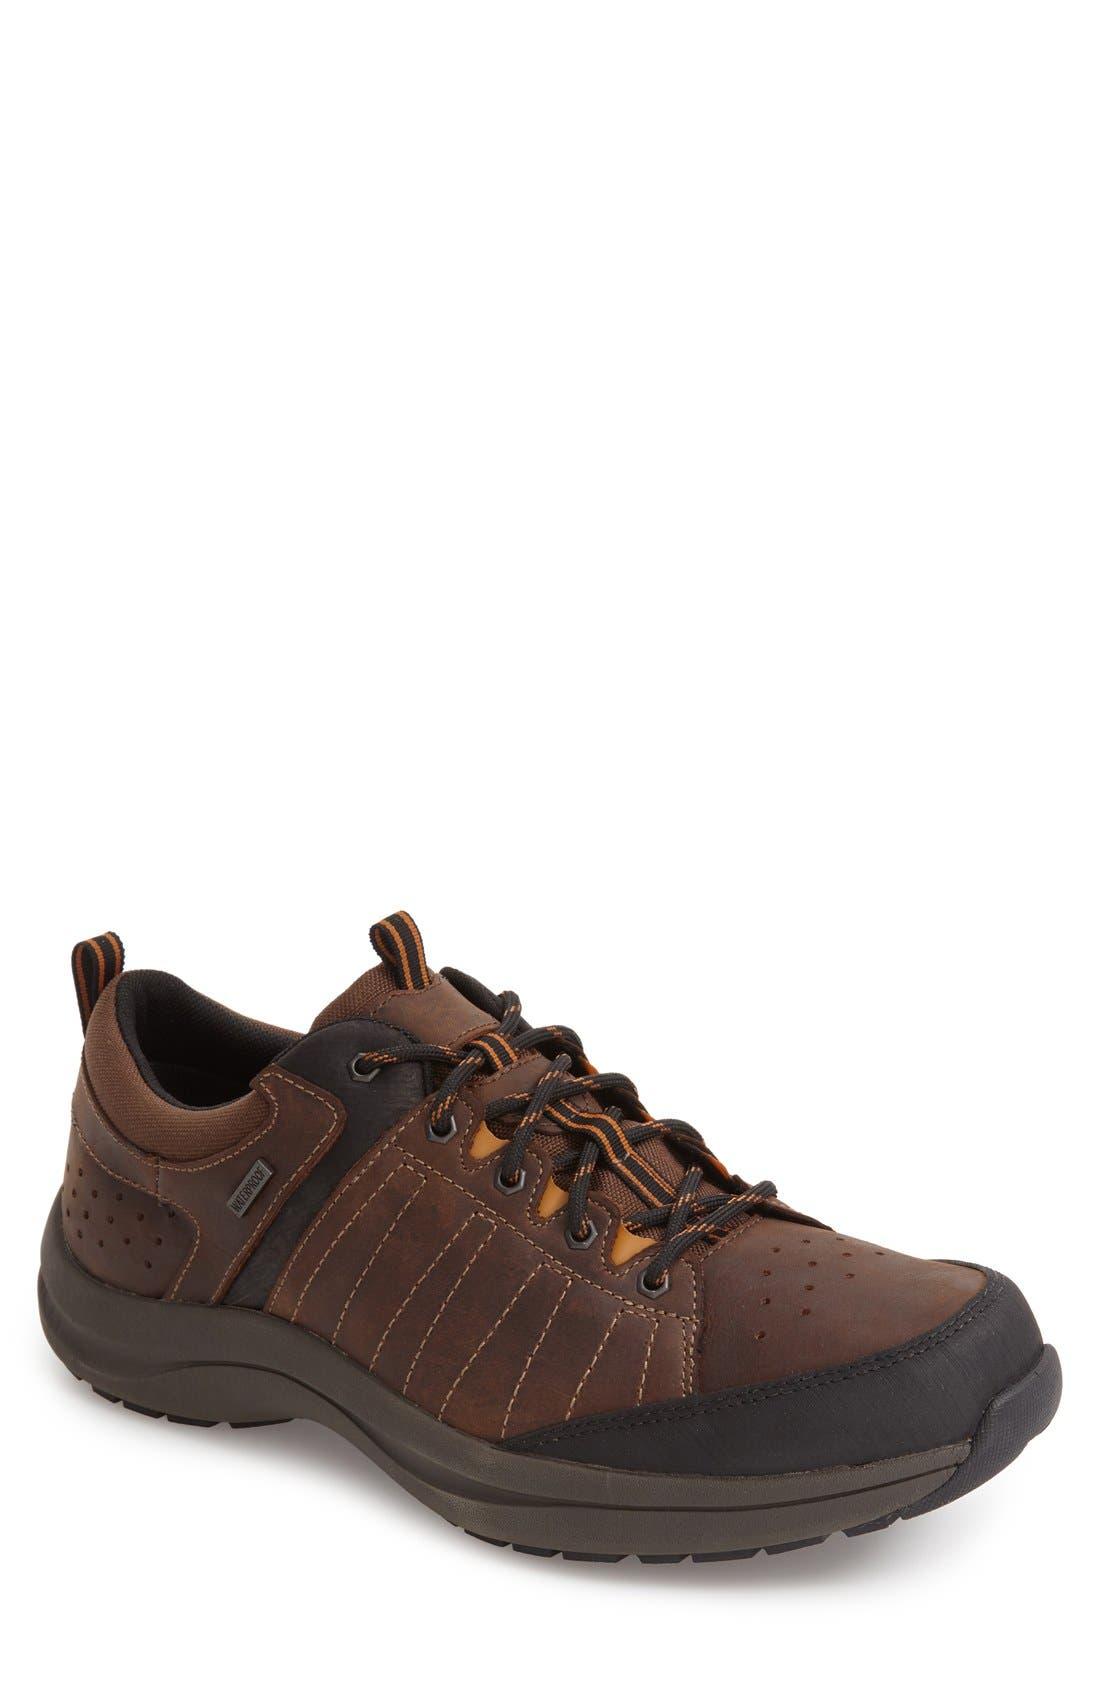 Seth-Dun Waterproof Sneaker,                             Alternate thumbnail 5, color,                             BROWN LEATHER